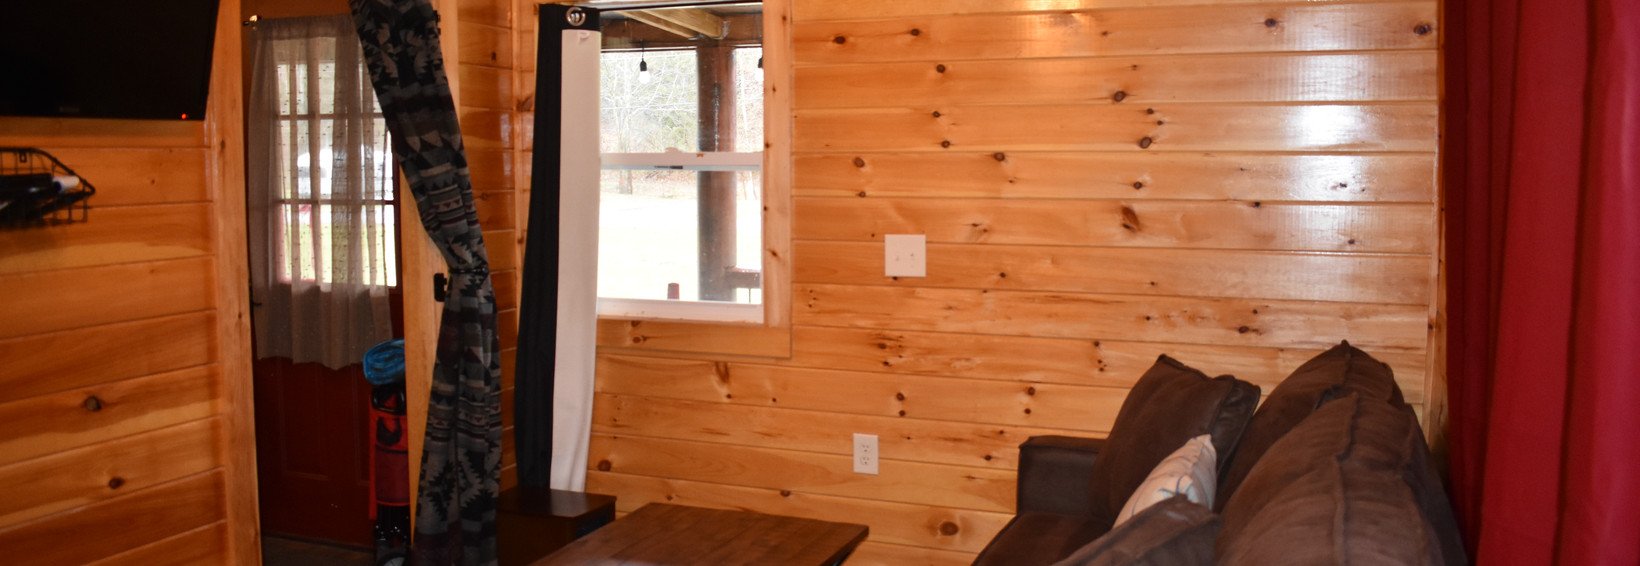 Hummingbird Cabin Entrance